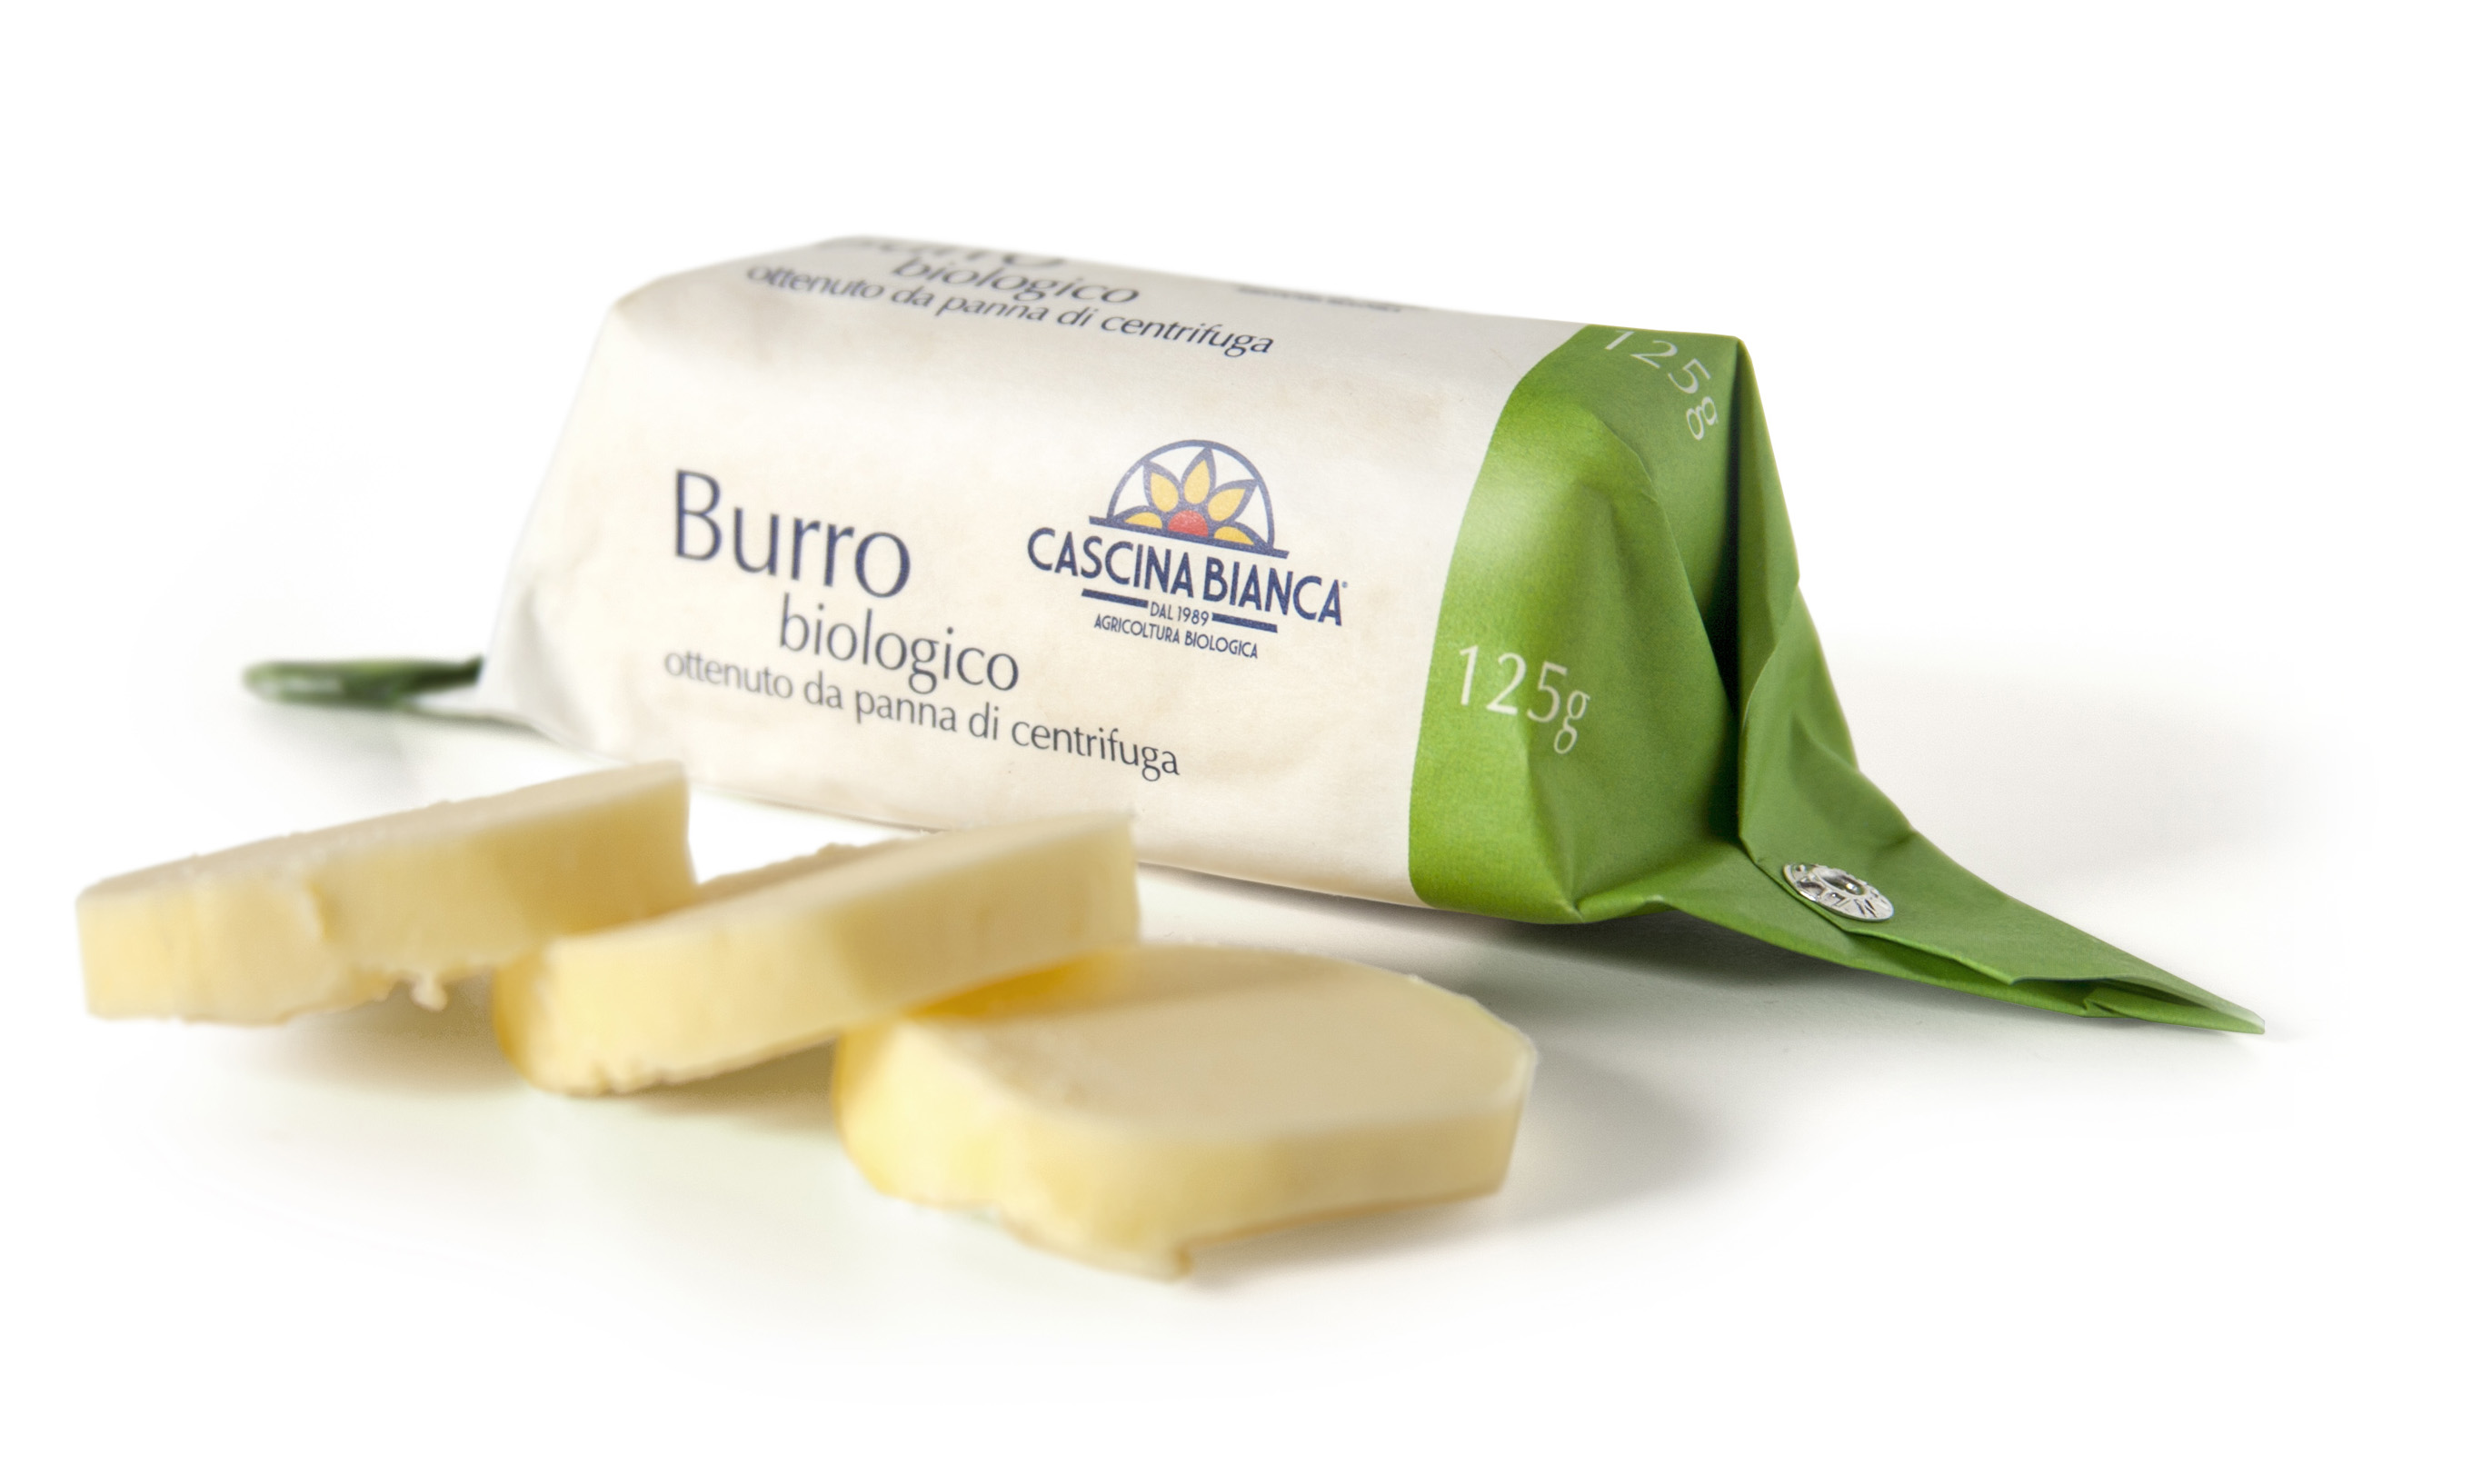 CascinaBianca_burro_biologico